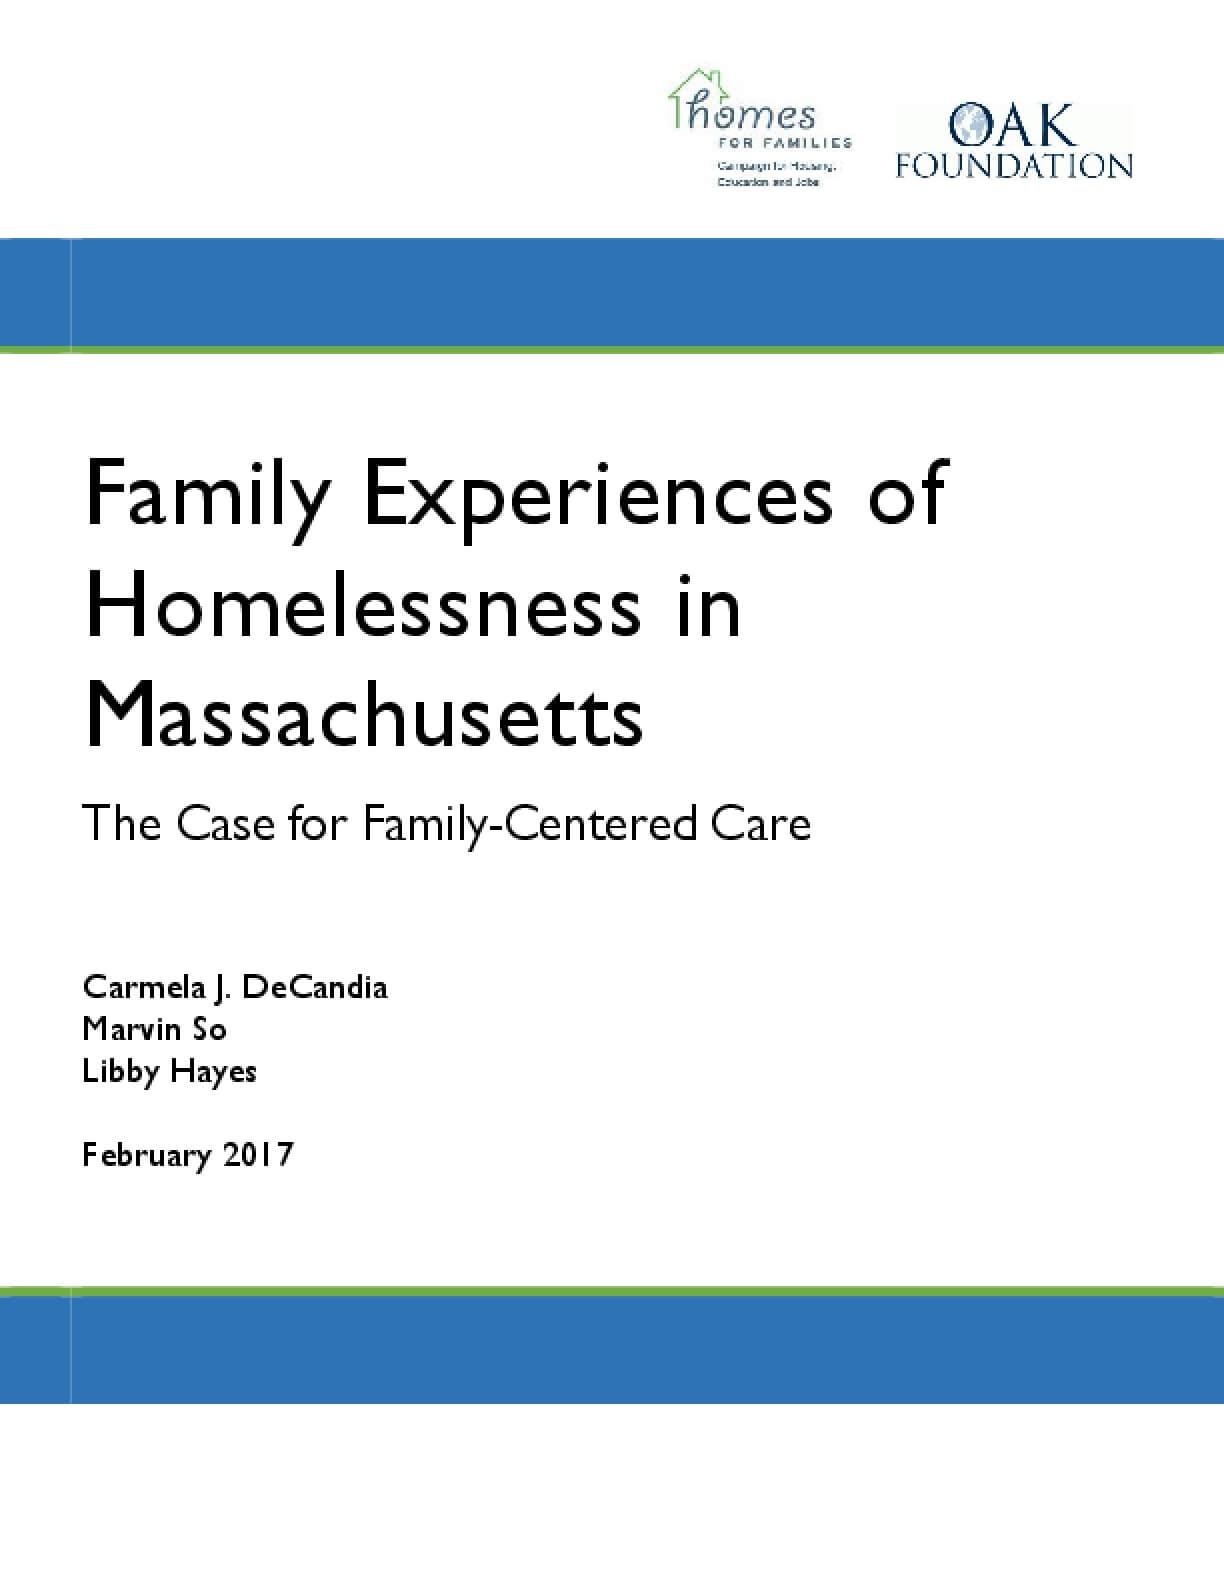 Family Experiences of Homelessness in Massachusetts: The Case for Family-Centered Care